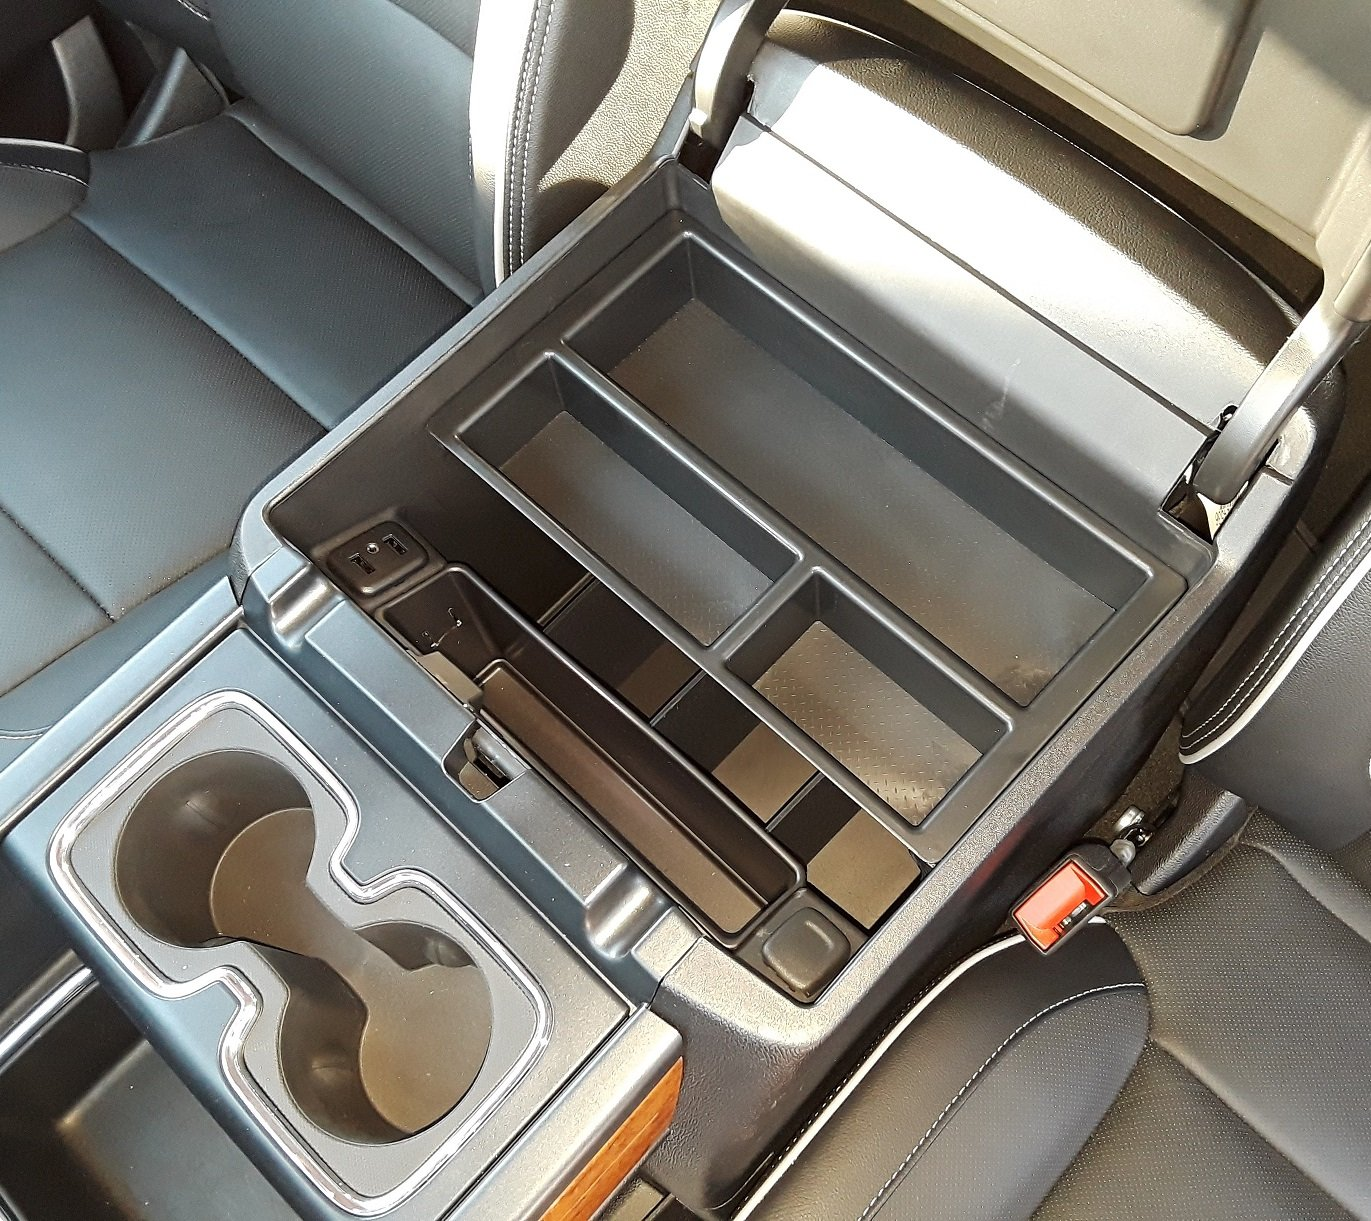 Buy Vehicle Ocd Organized Console Device Chevy Silverado 1500 Gmc Sierra 1500 2014 18